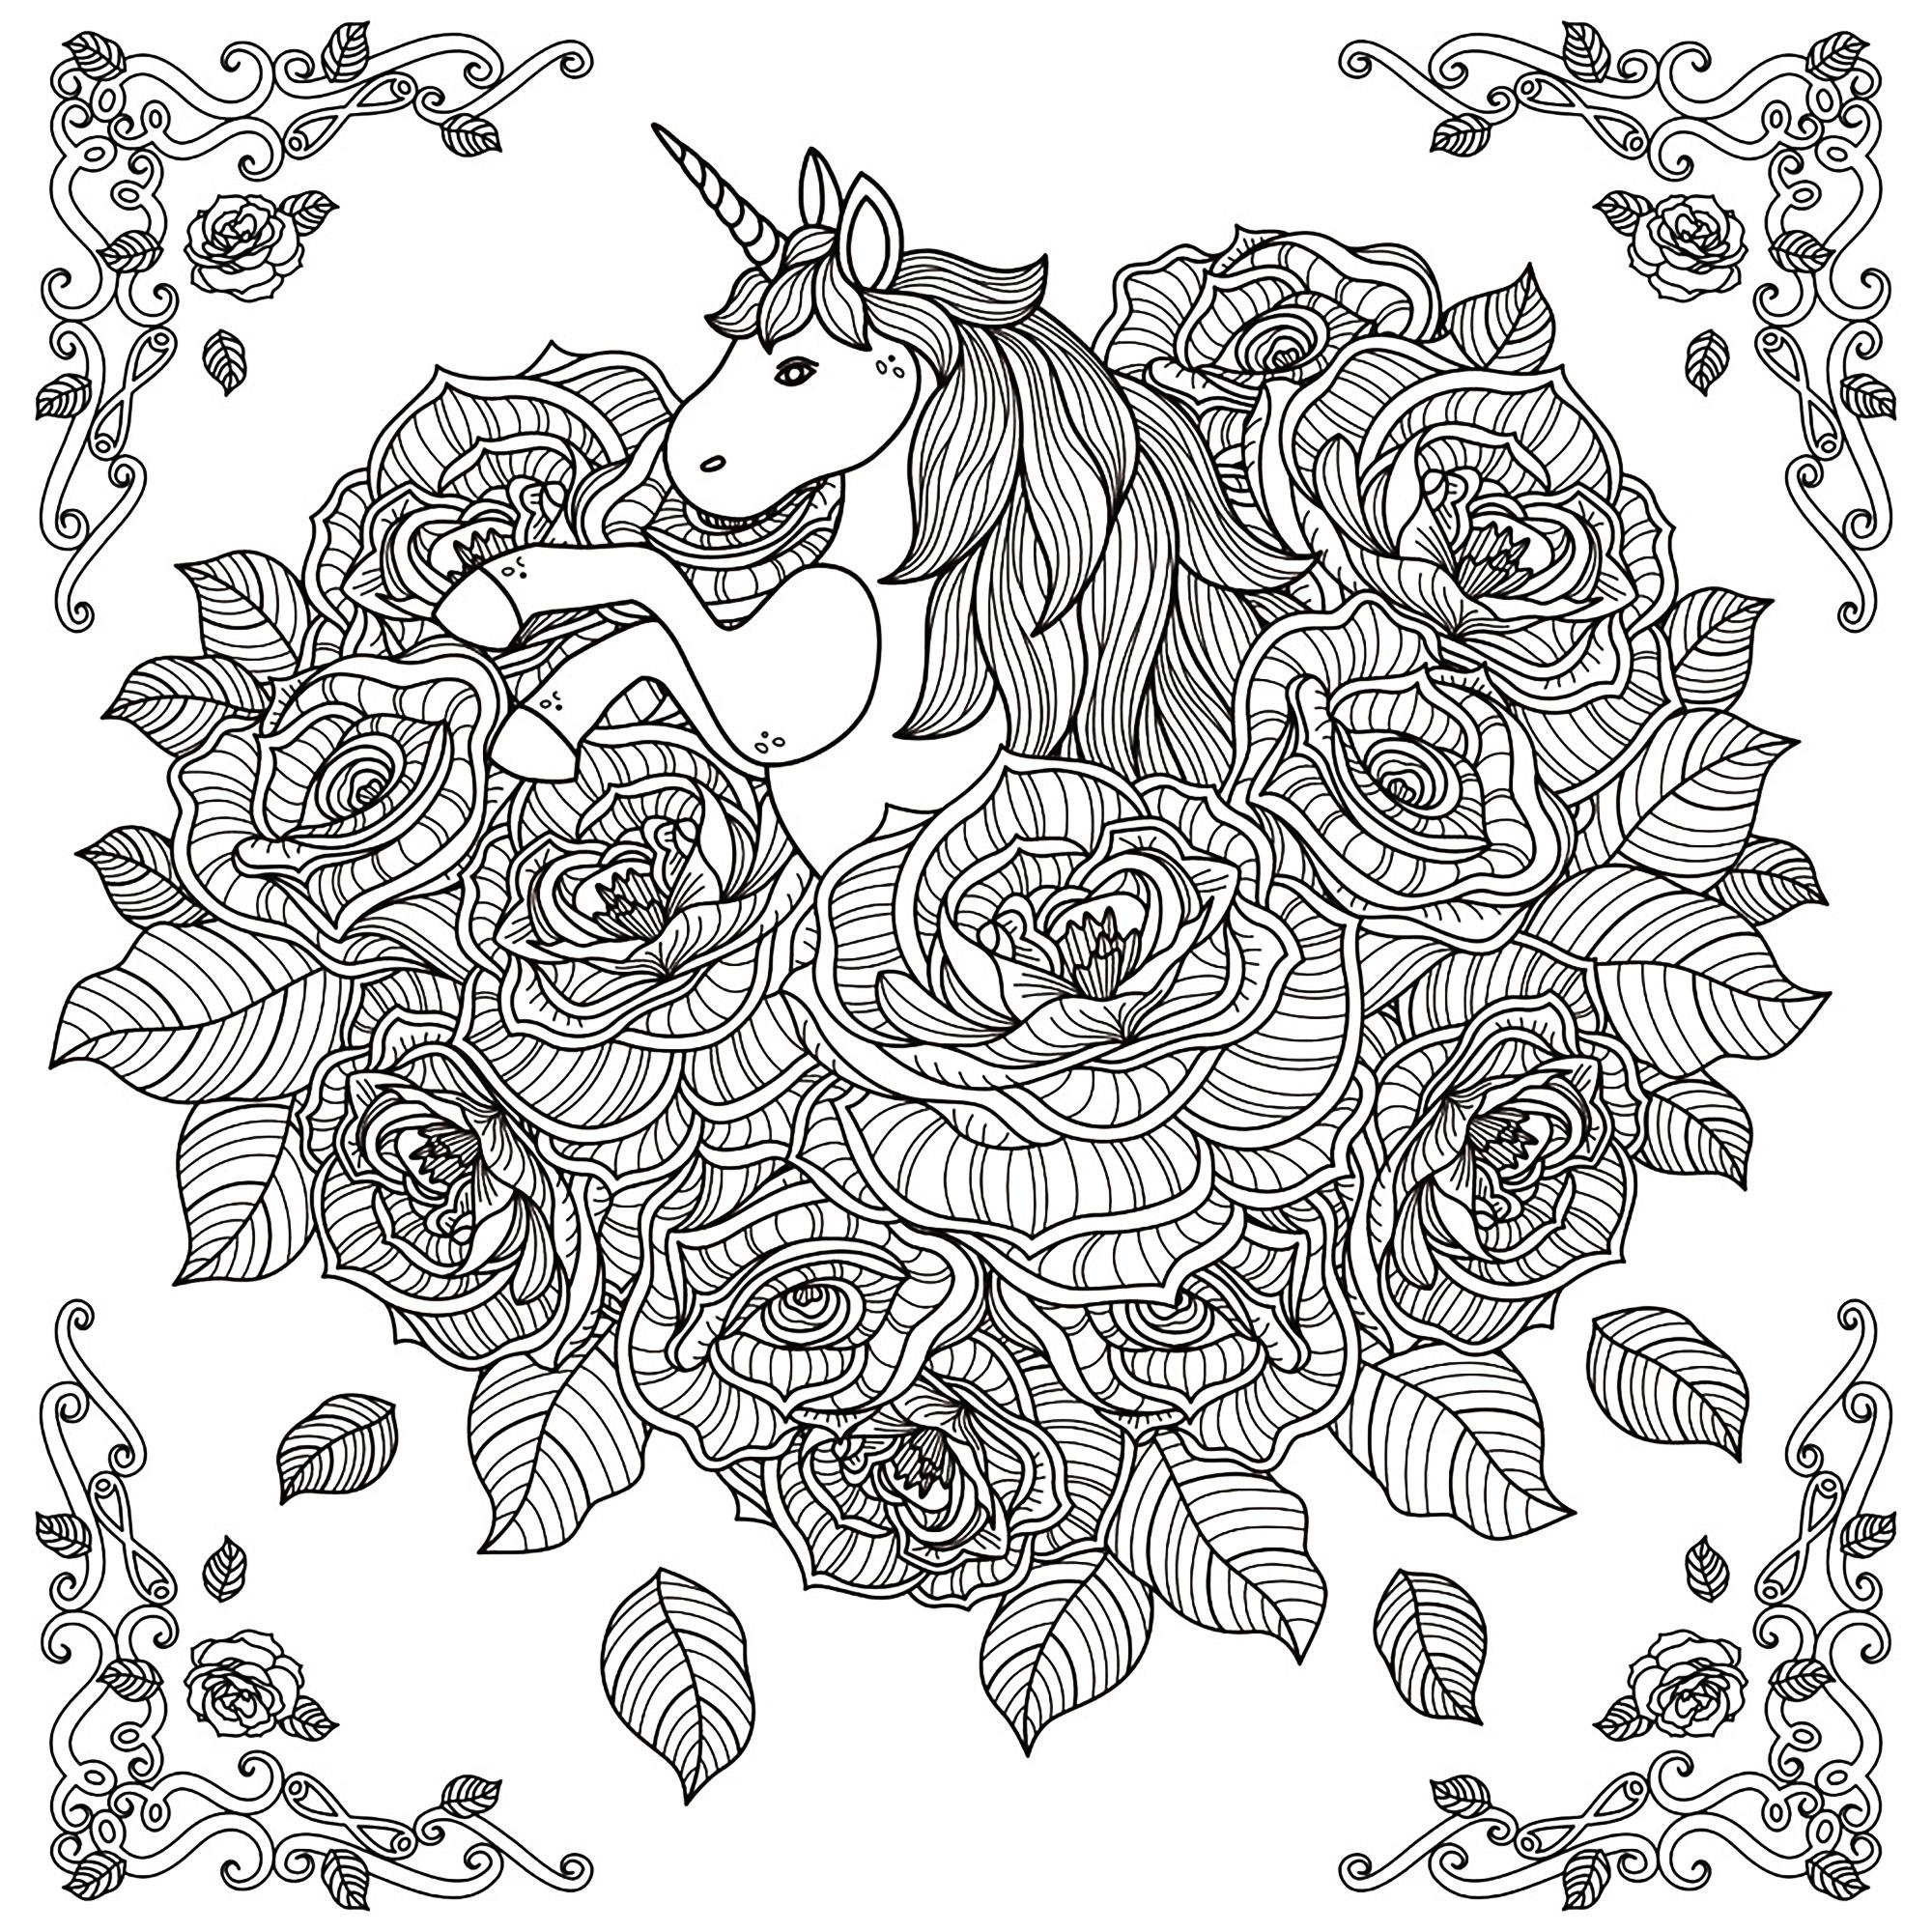 Unicorni 17547 - Unicorni - Colorear para Adultos